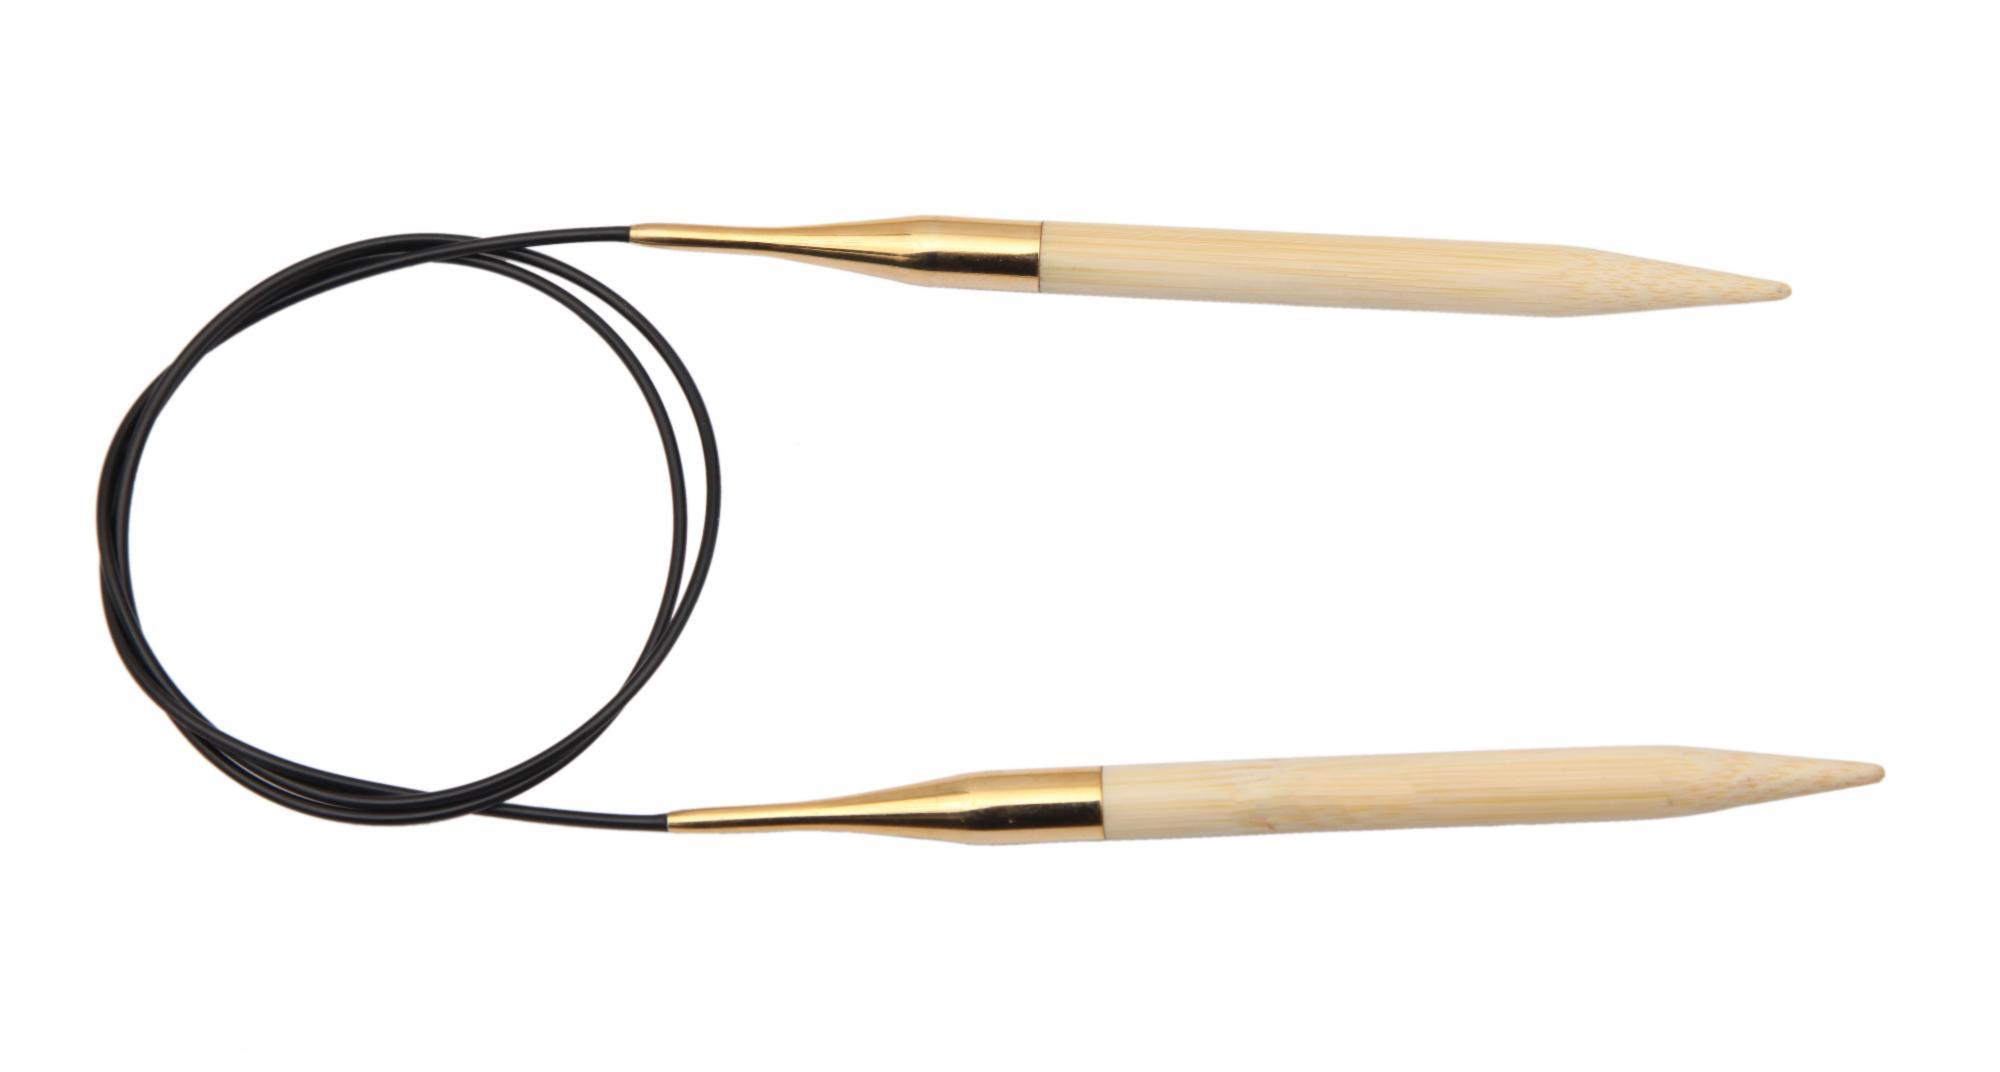 Спицы круговые 80 см Bamboo KnitPro, 22256, 10.00 мм